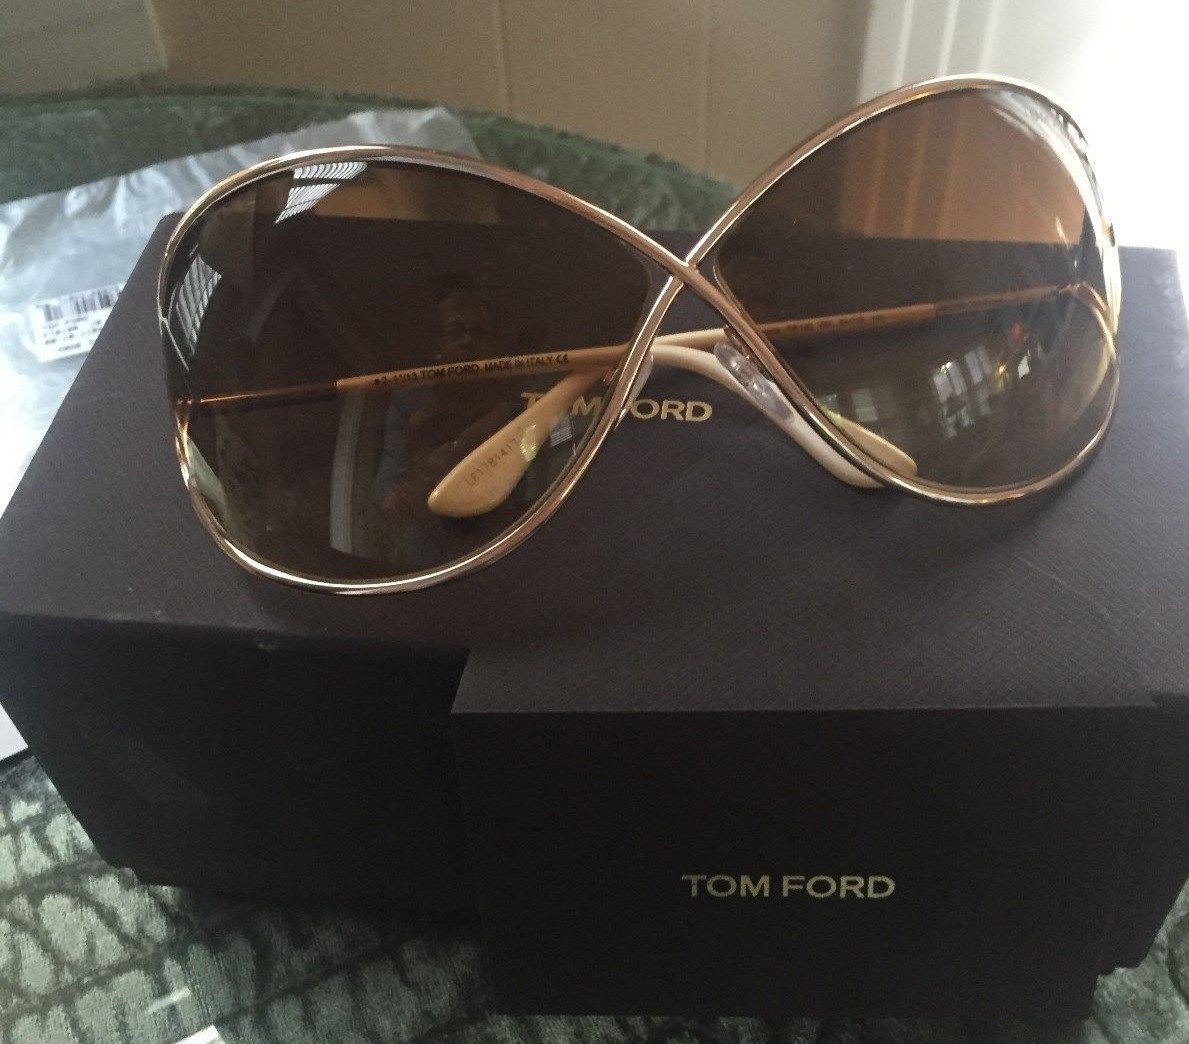 TOM FORD SUNGLASSES (Like Michelle Dockery wears in  Good Behavior )